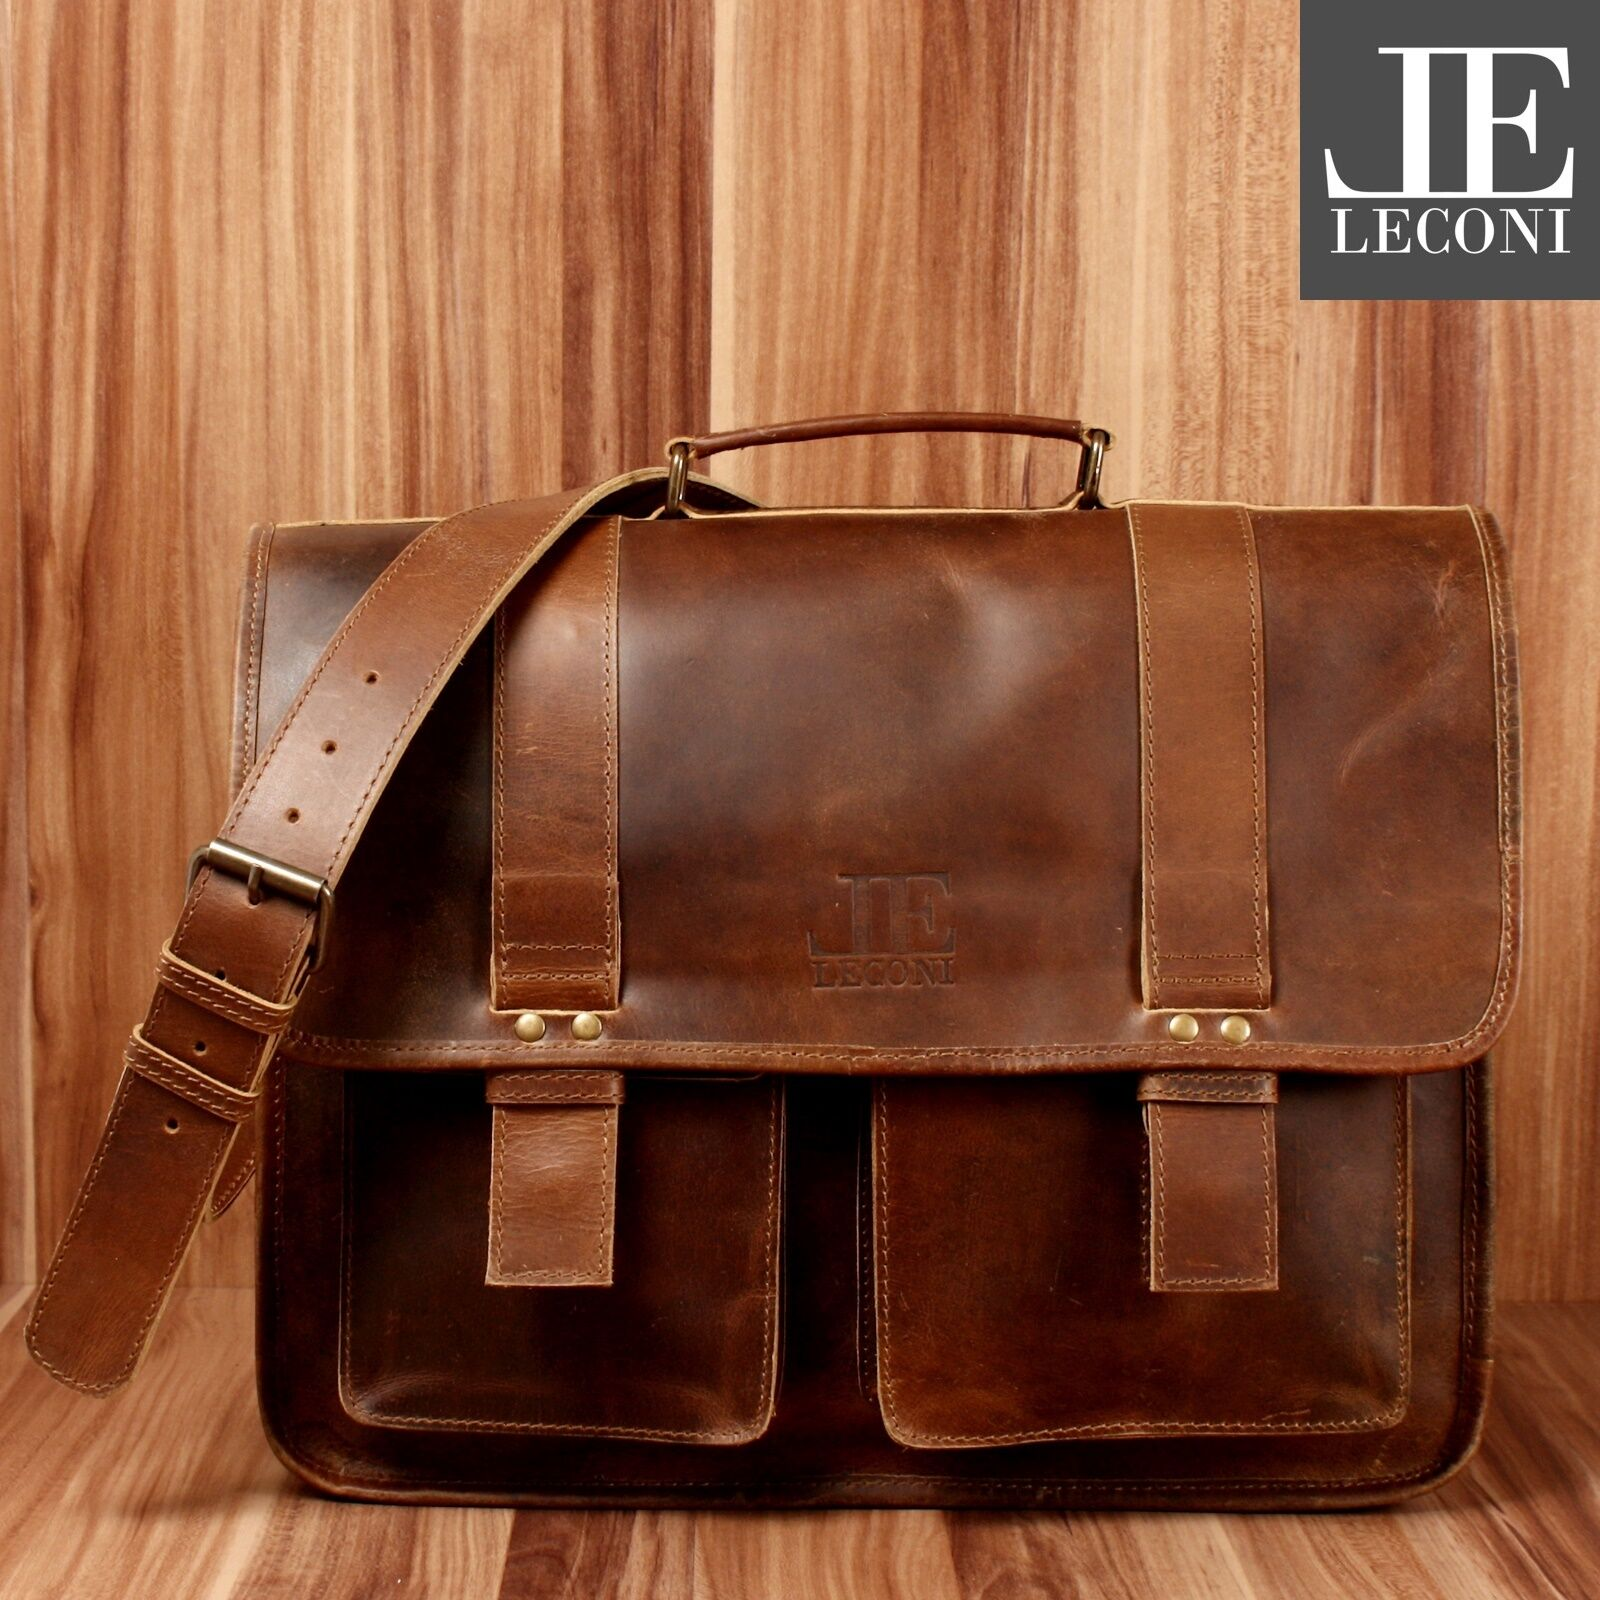 LECONI Aktentasche XL Collegetasche Messenger Bag Büffelleder mittelbraun LE3030 | Marke  | Hochwertige Produkte  | Verrückter Preis